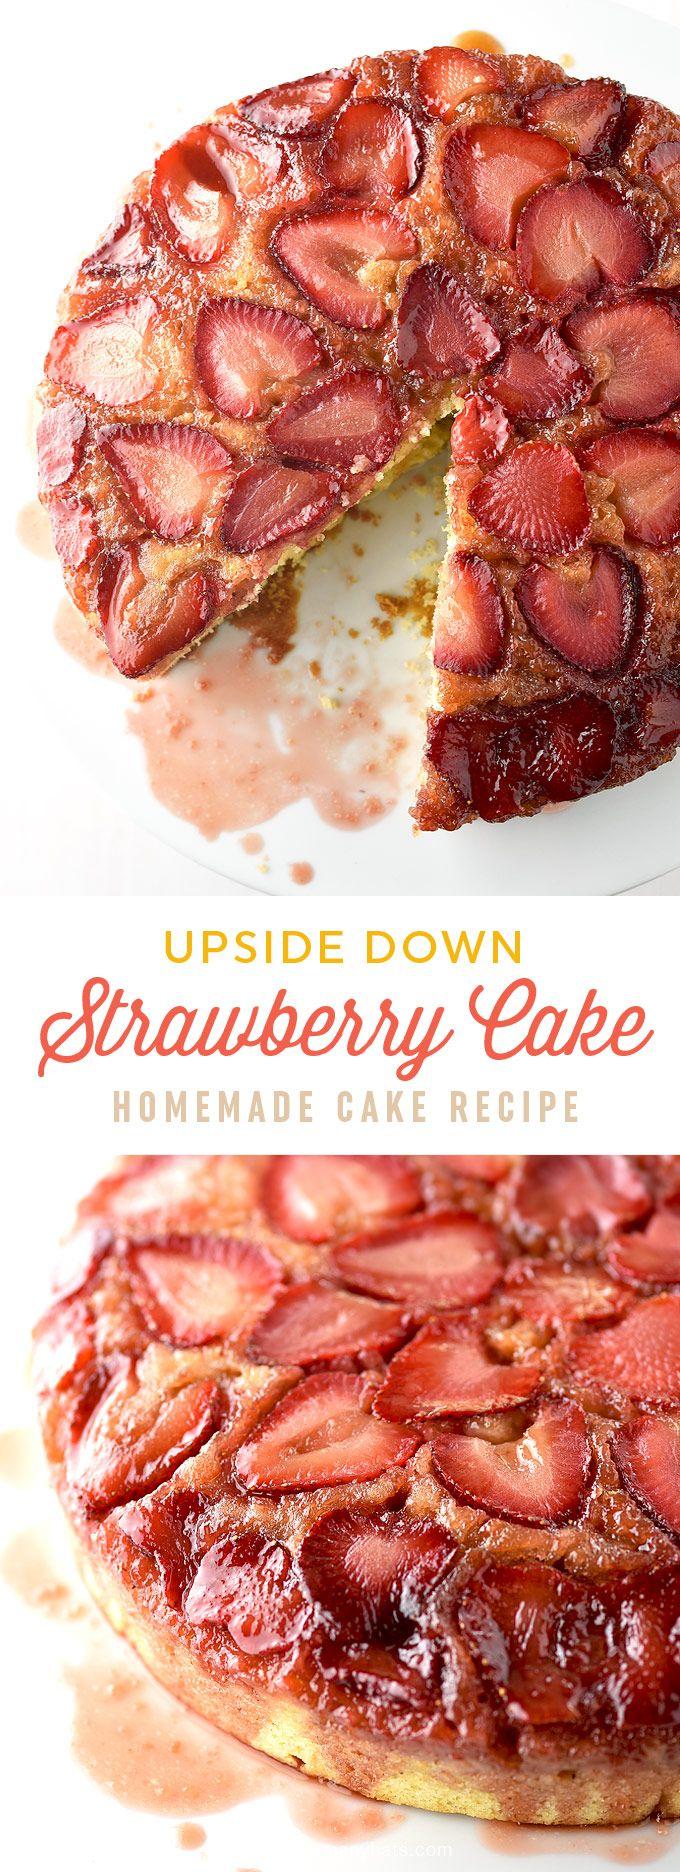 Easy Strawberry Upside Down Cake Recipe | shewearsmanyhats.com